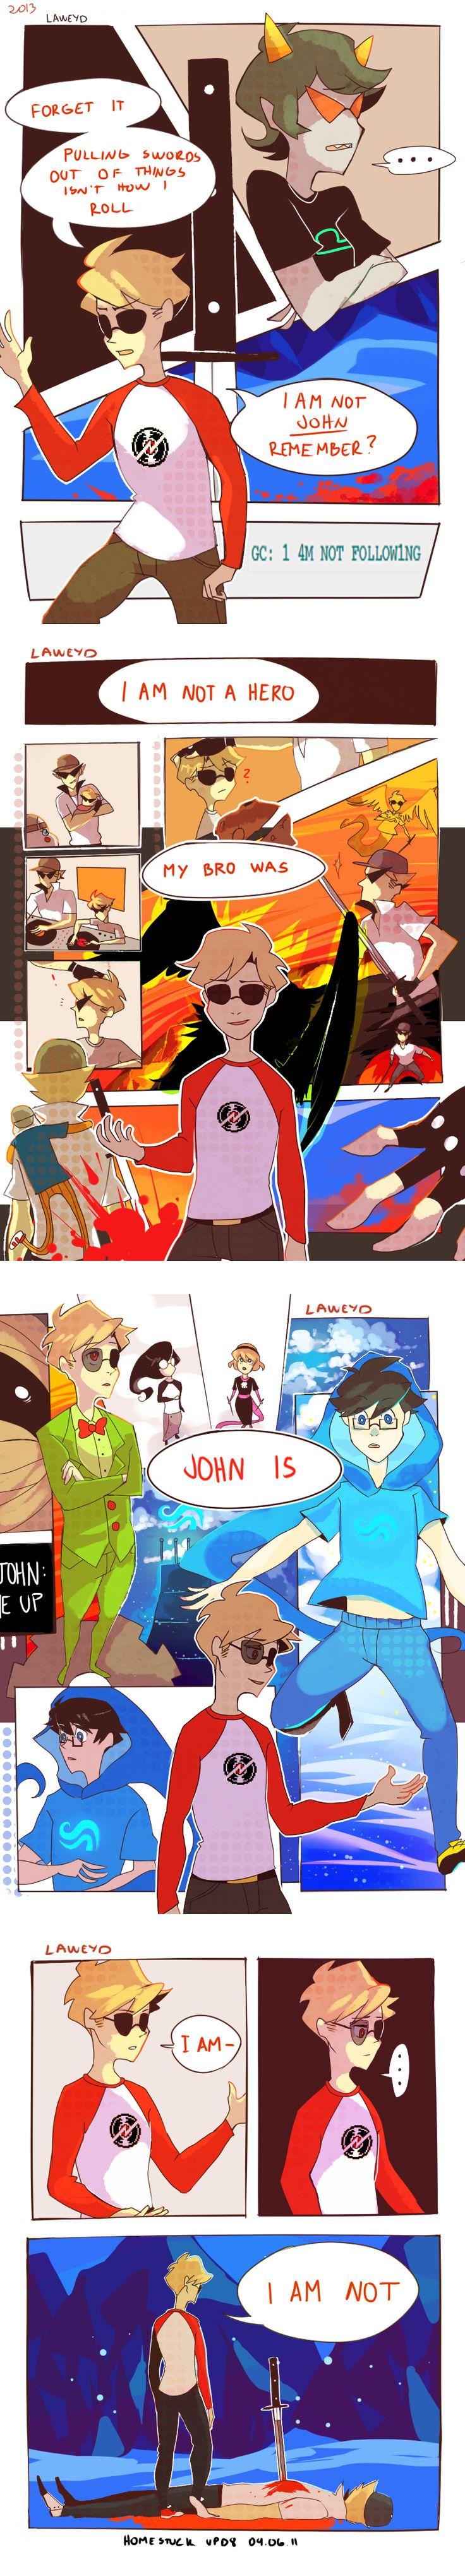 homestuck comic (upd8- 04.06.11)- i am not a hero by LaWeyD.deviantart.com on @deviantART